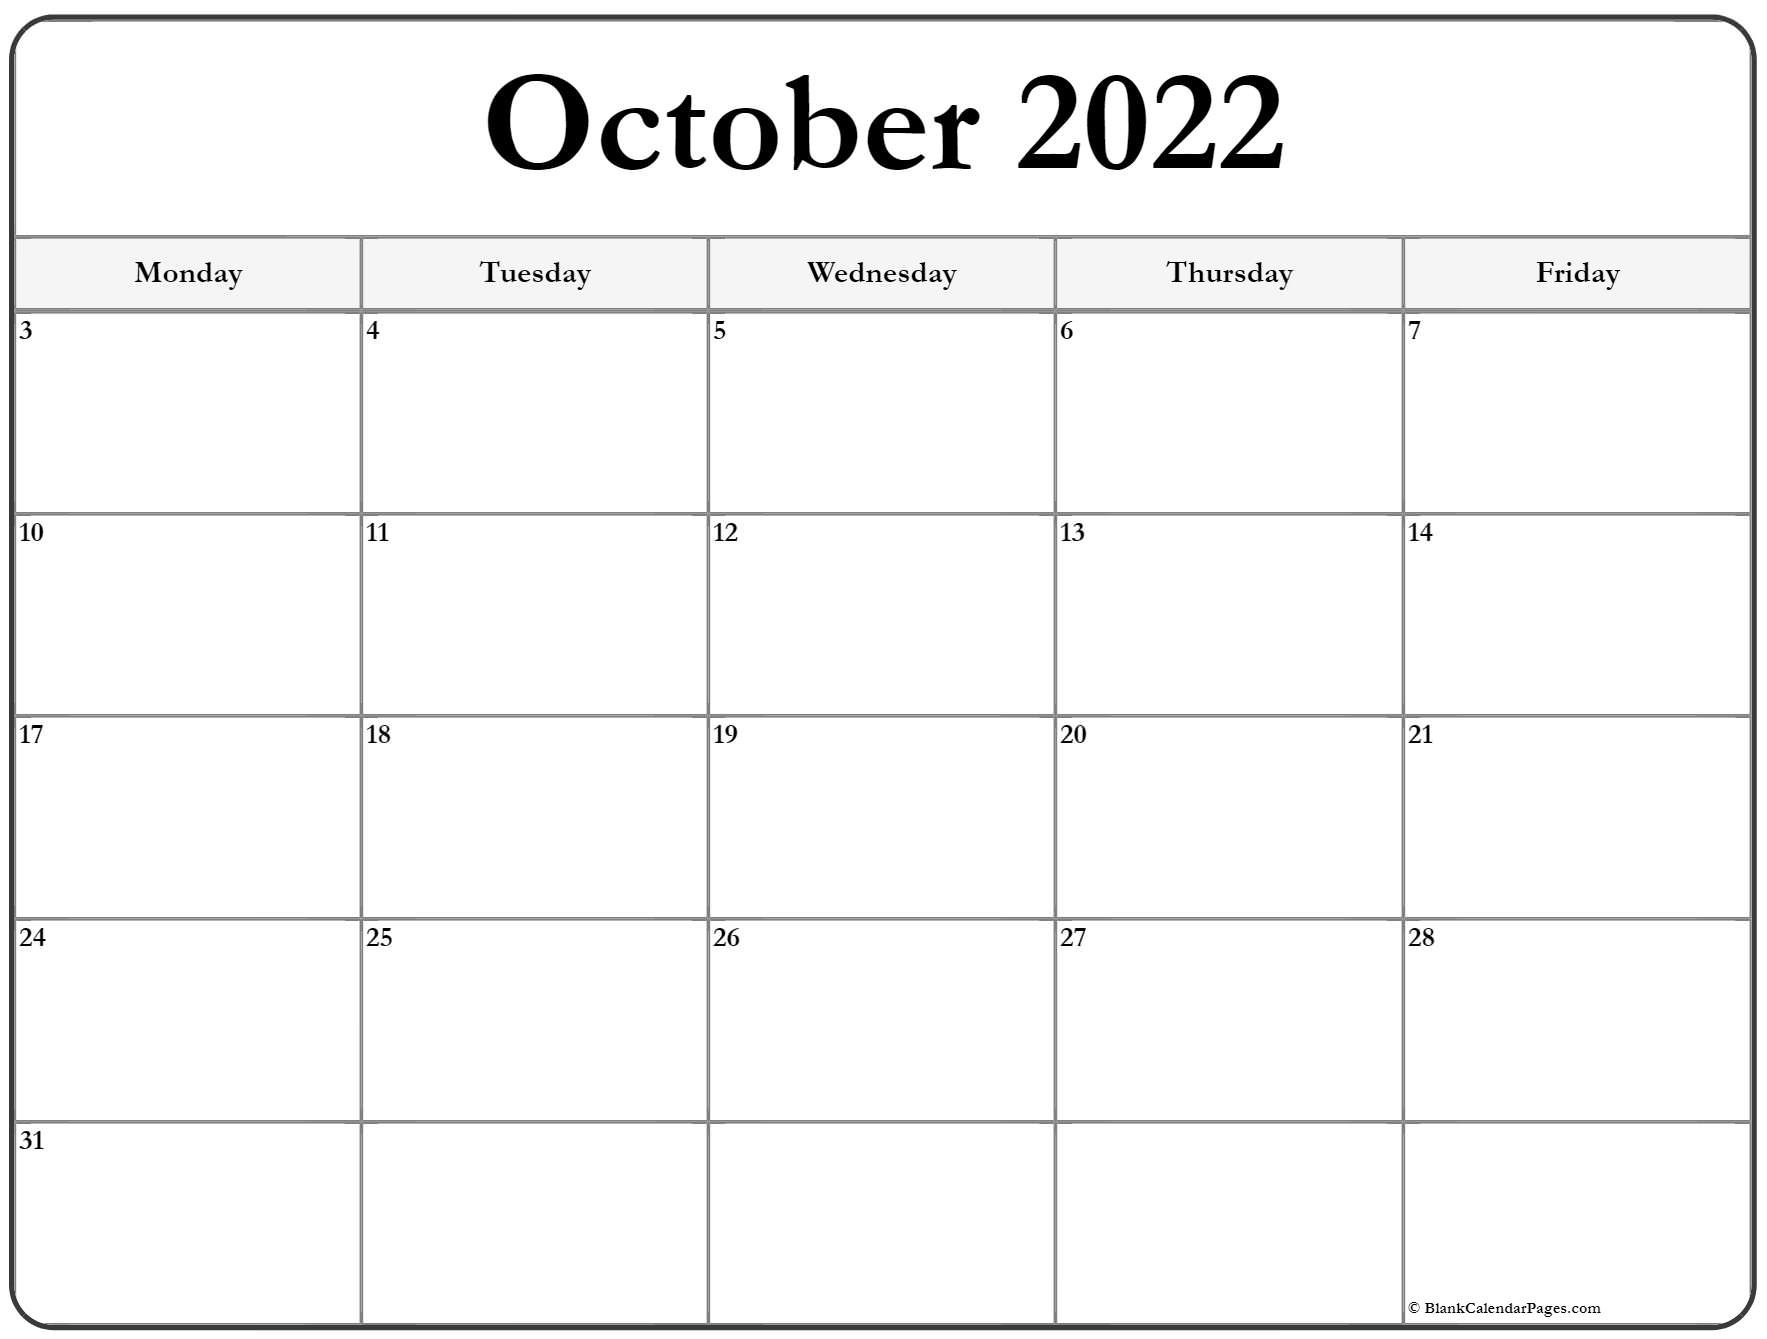 October 2022 Monday Calendar | Monday To Sunday Monday To Friday Calendar Printable